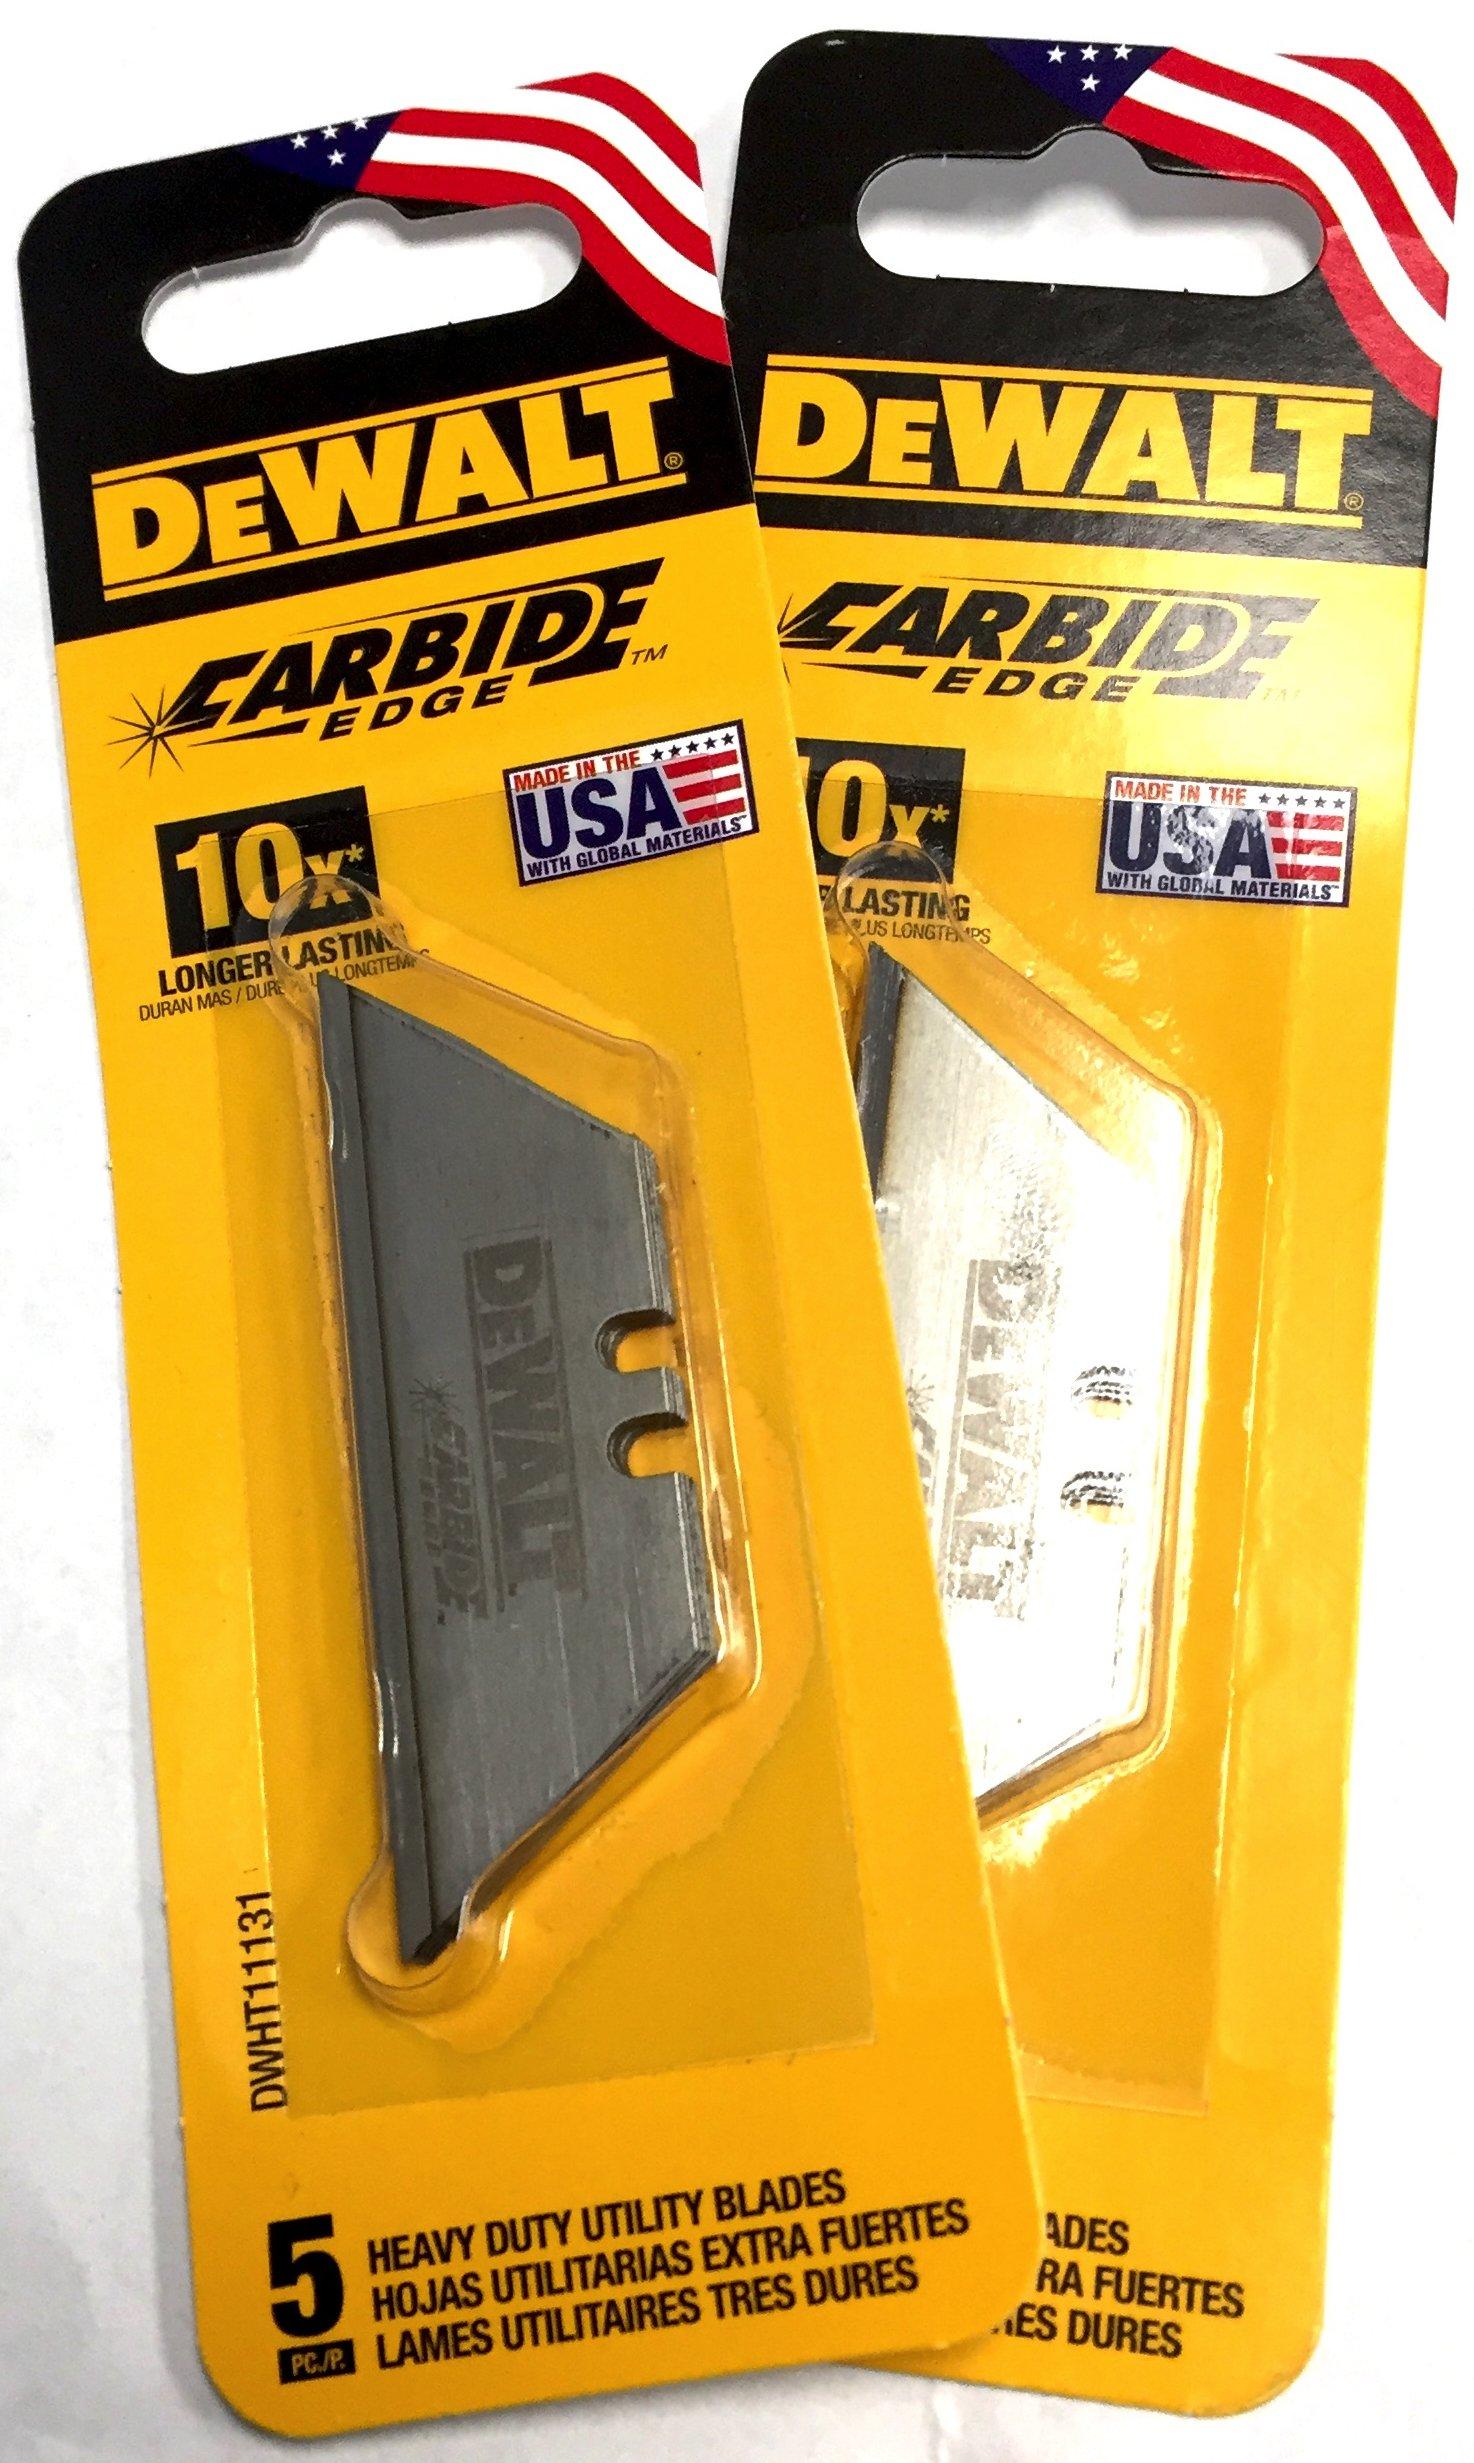 DeWalt Carbide Edge Utility Knife Blade - Last 10x Longer (10-Pack)